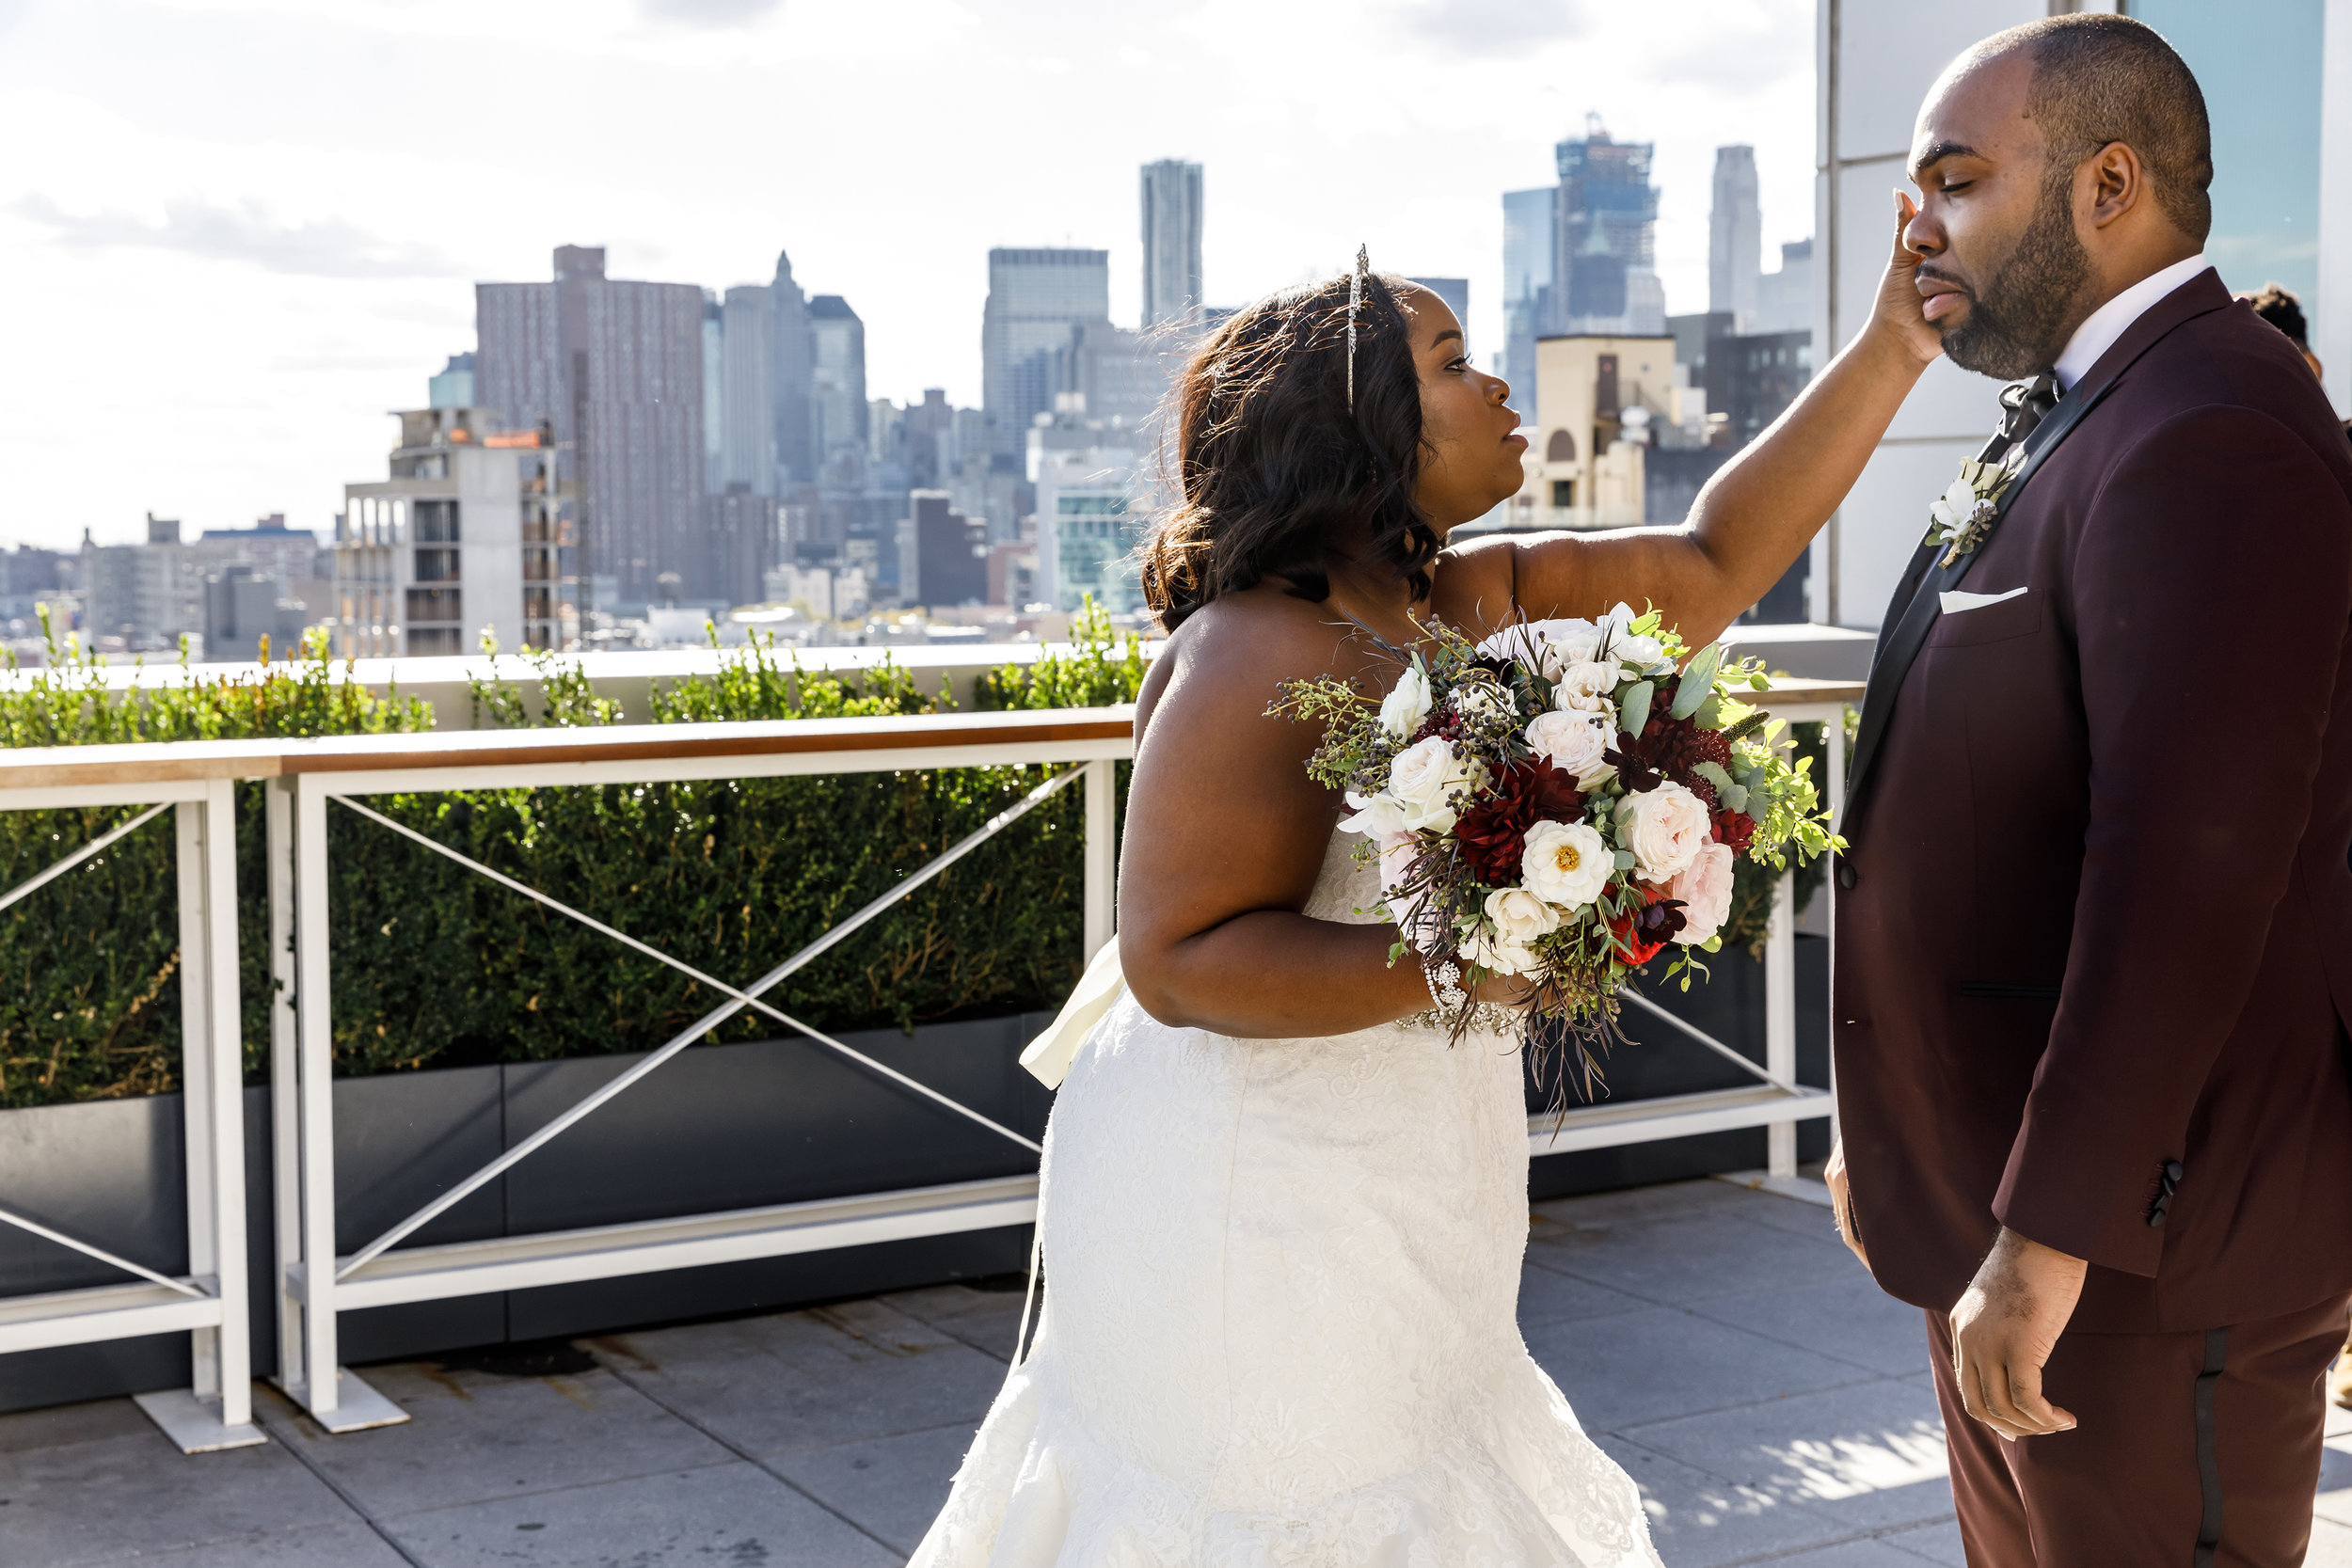 victorious-events-nyc-024-yanique-rondel-greenpoint-loft-wedding-amy-anaiz.jpg